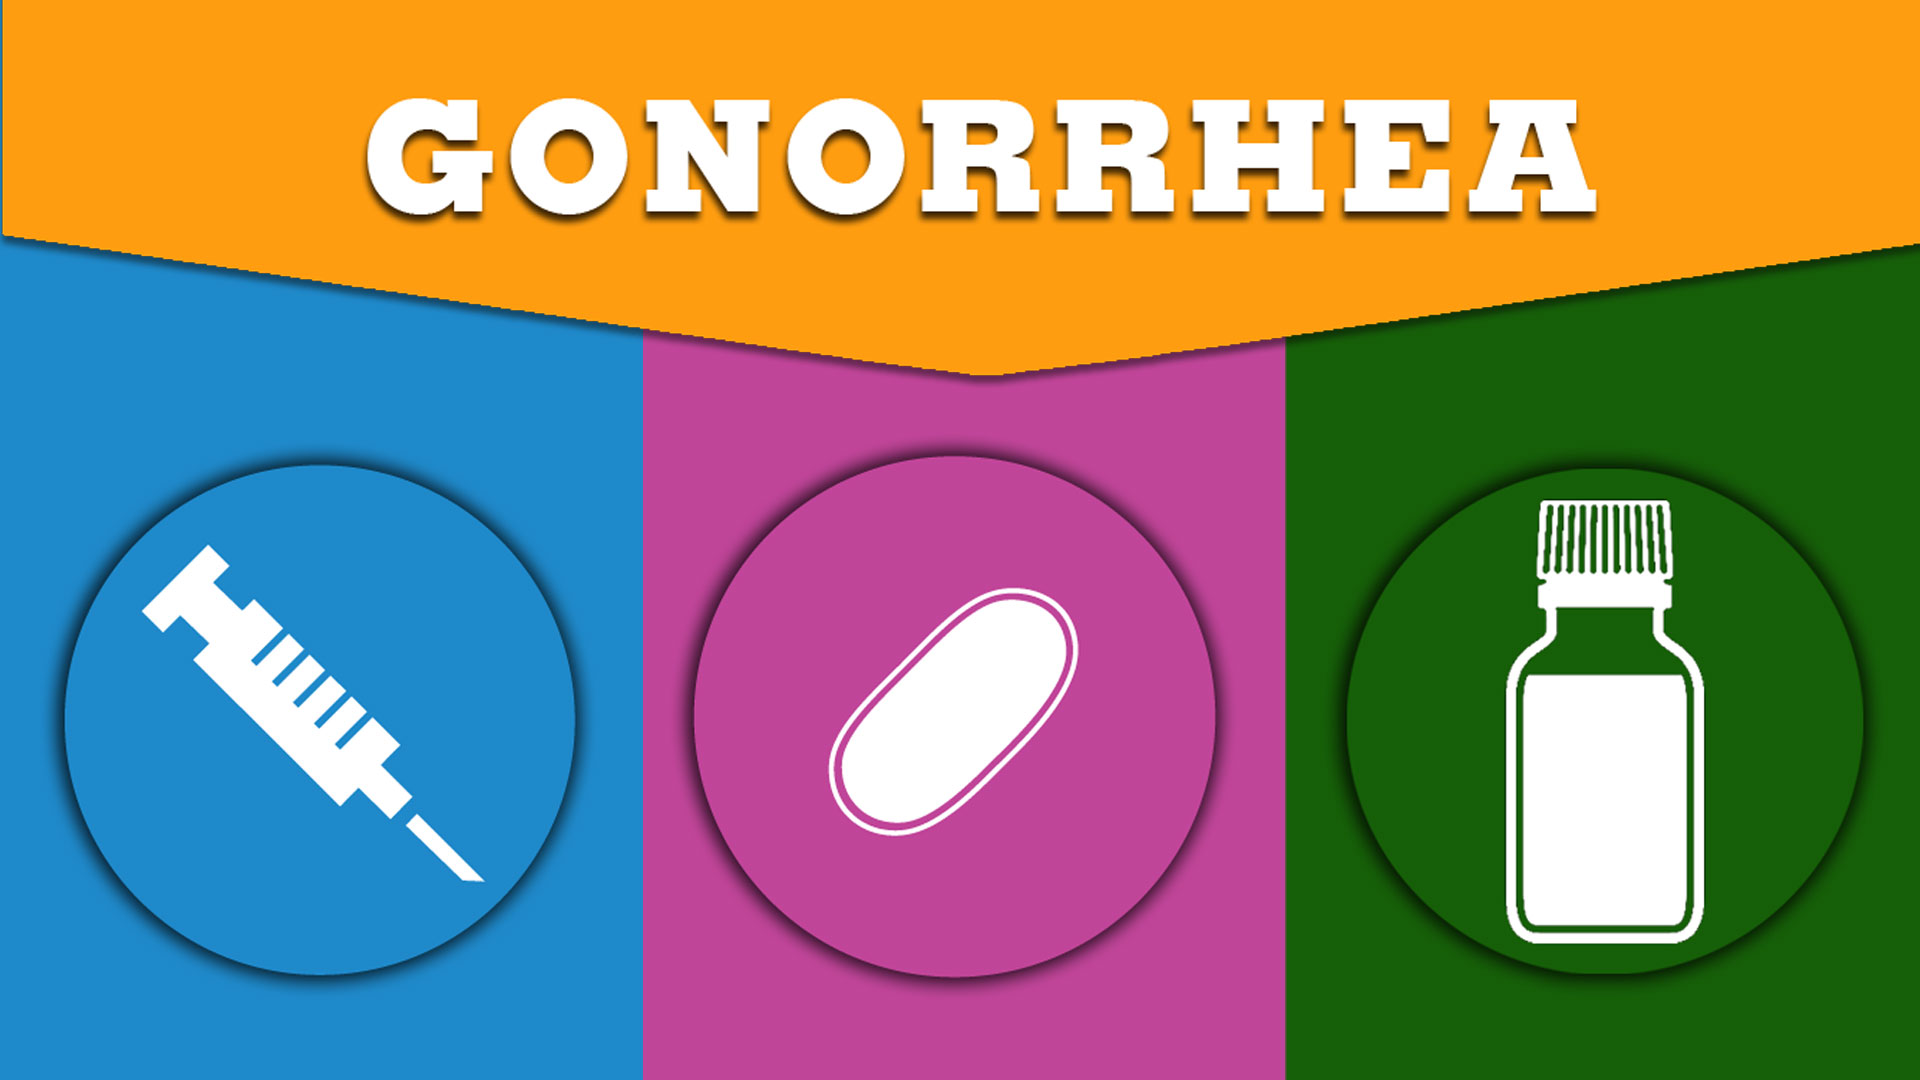 03.Gonorrhea